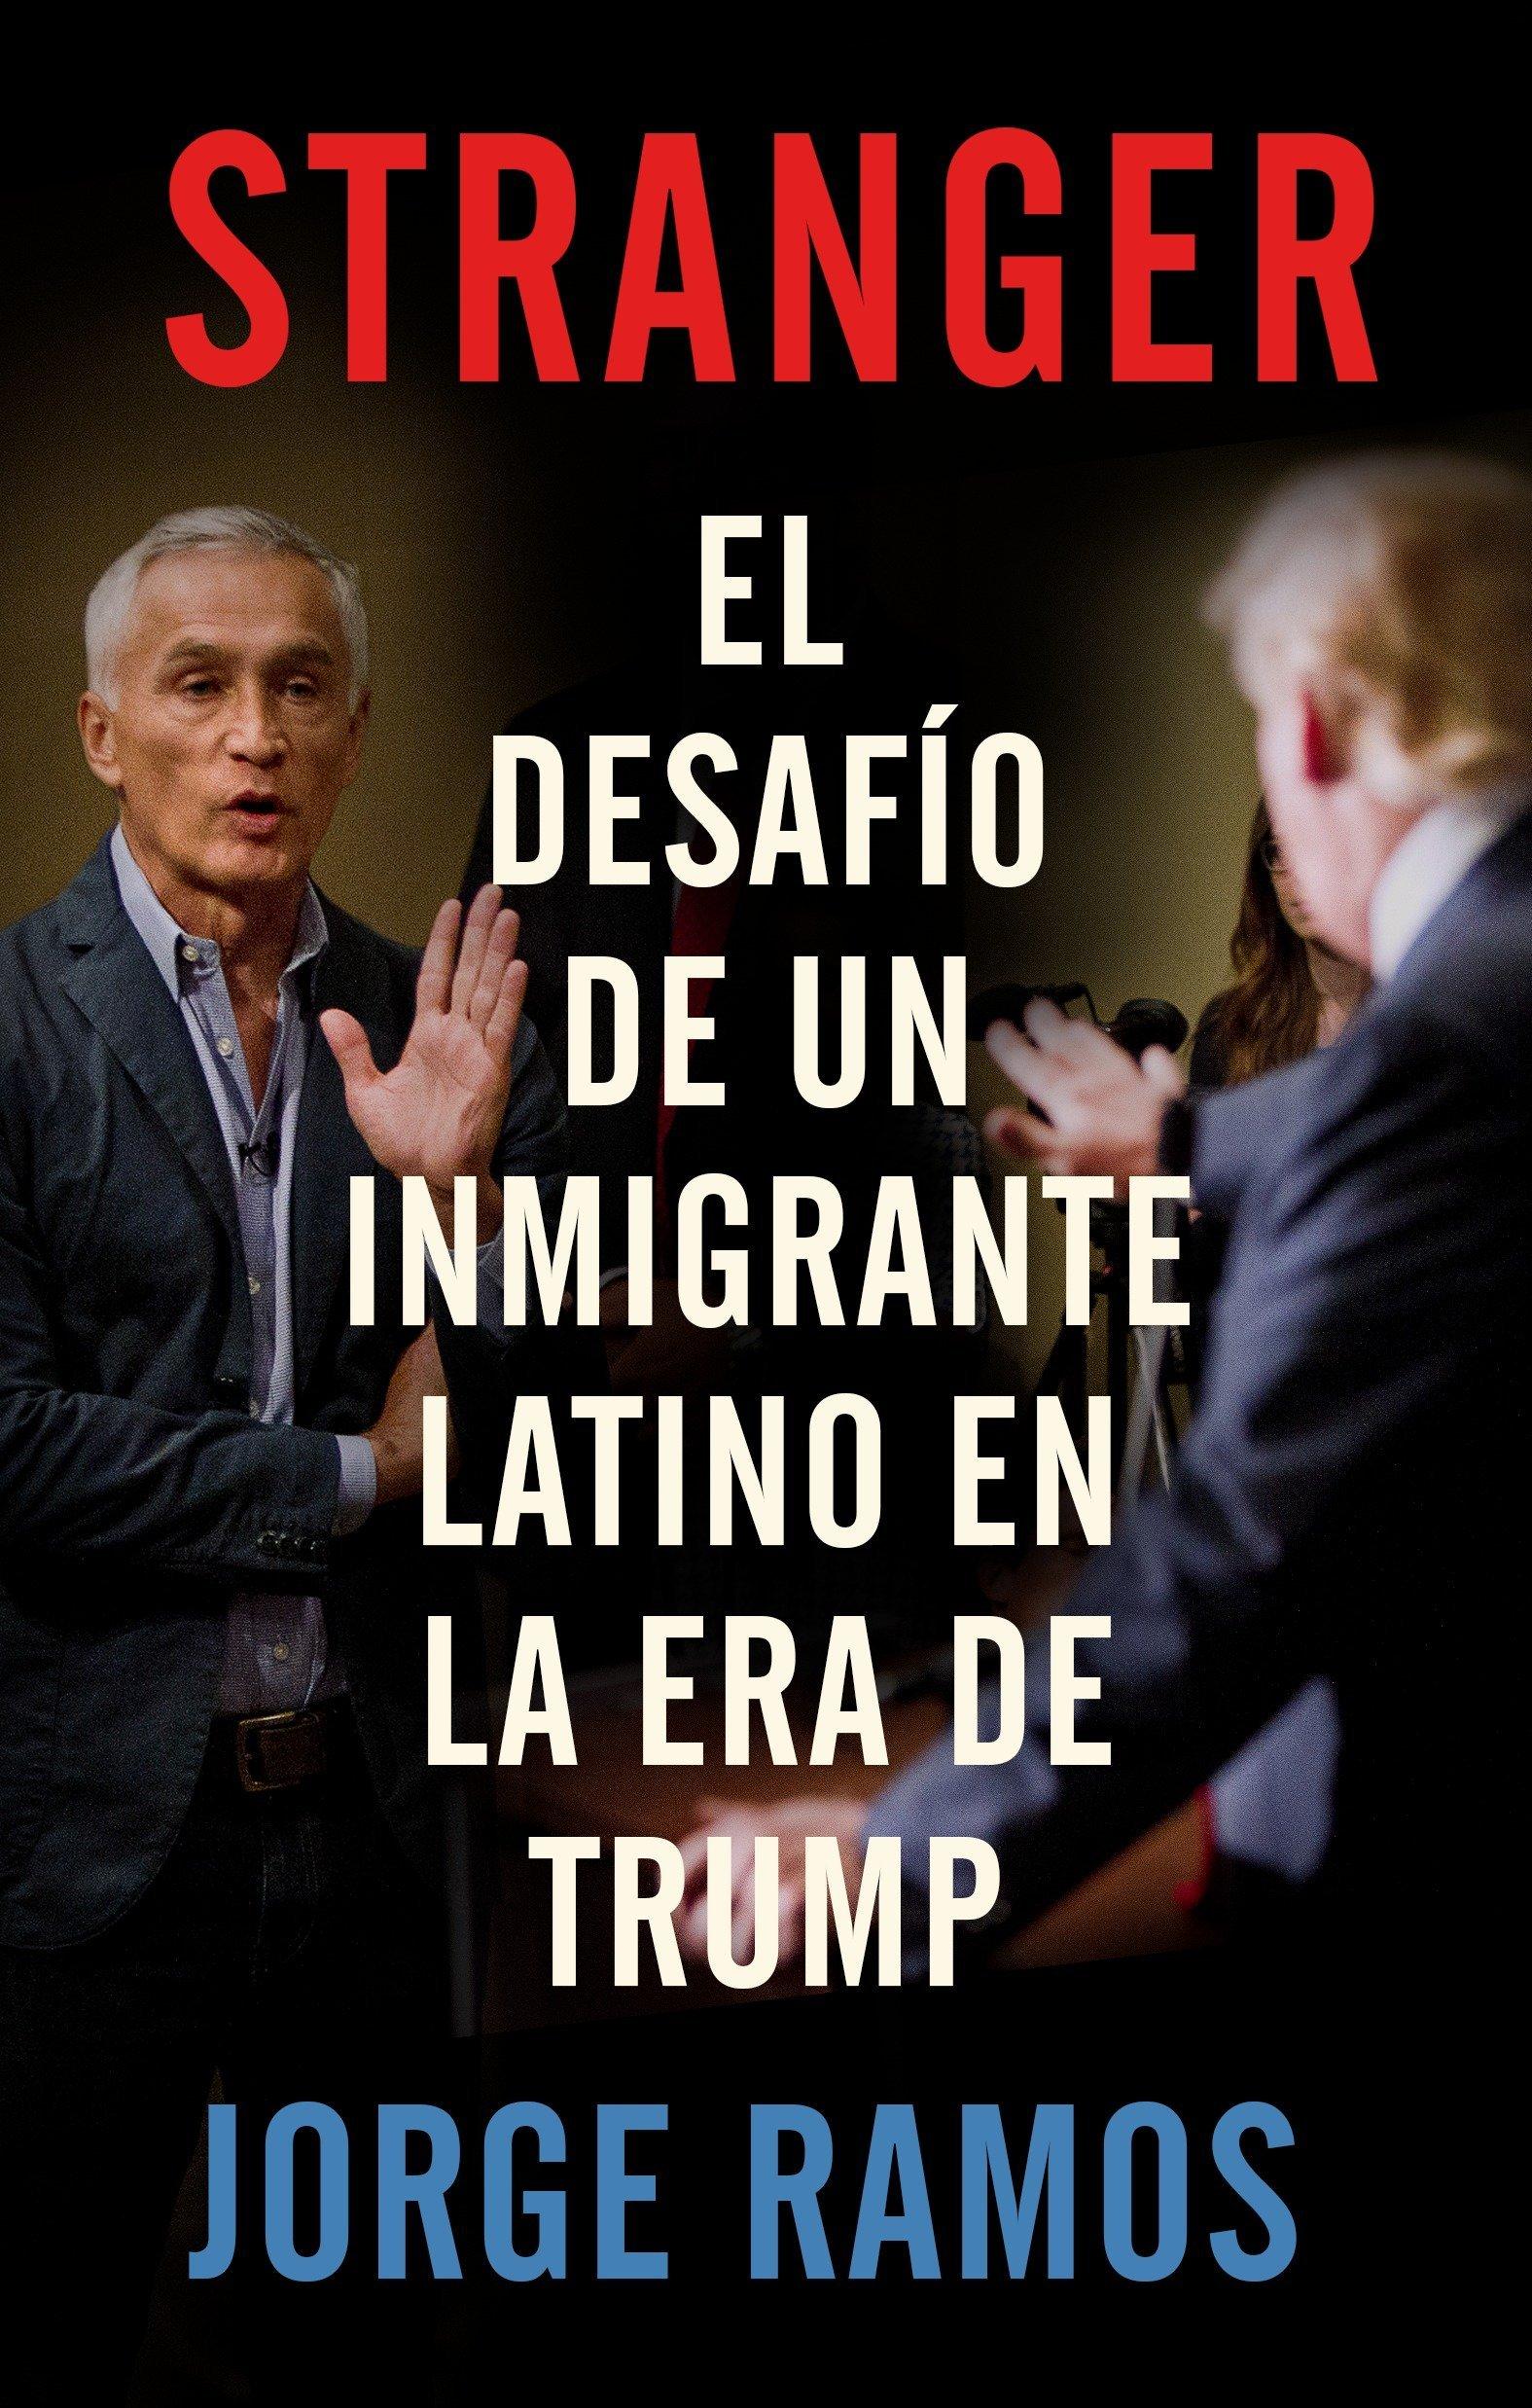 Stranger (En Espanol): El Desafio de Un Inmigrante Latino En La Era de Trump Tapa blanda – 27 feb 2018 Jorge Ramos Ezra E. Fitz RANDOM HOUSE ESPANOL 0525563776